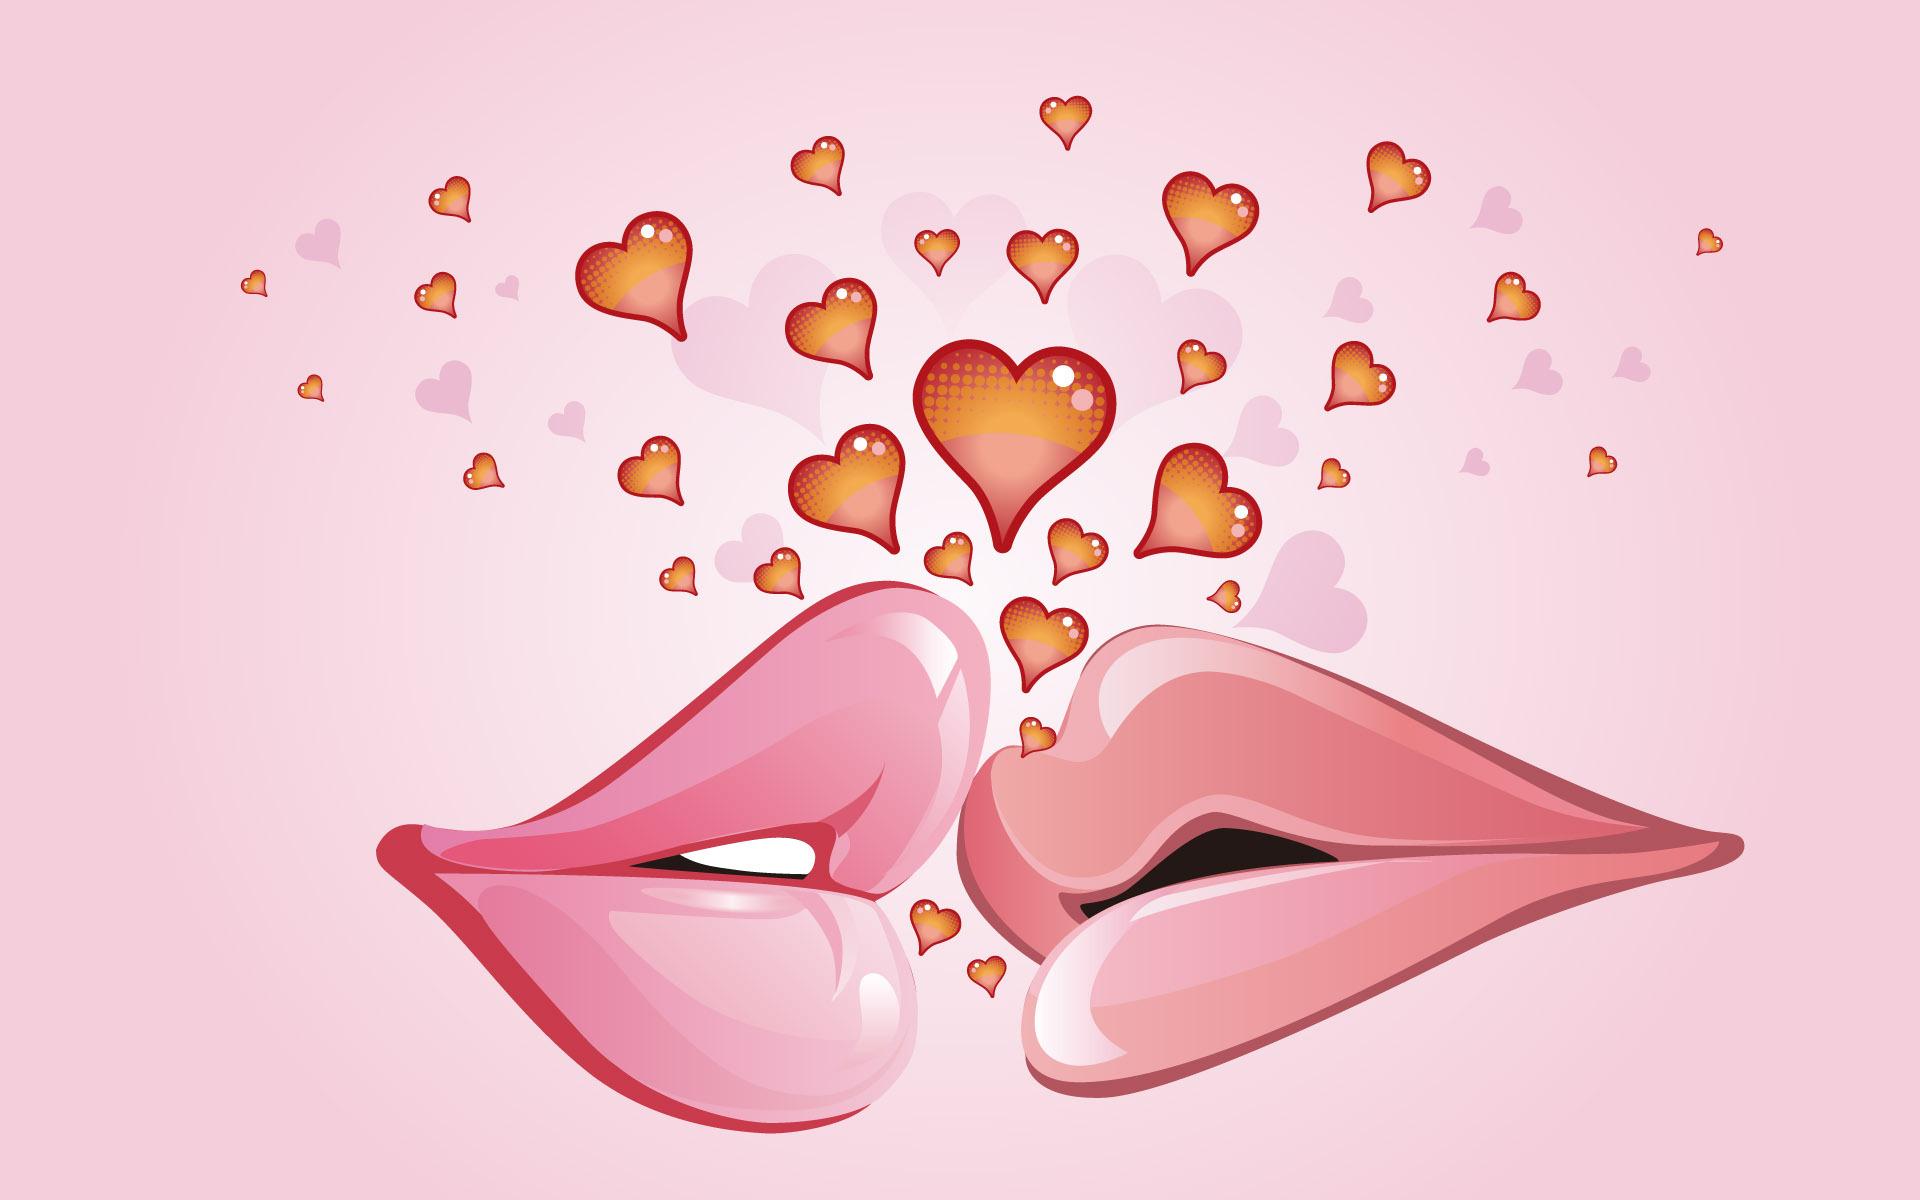 Картинки про любовь подборка 6